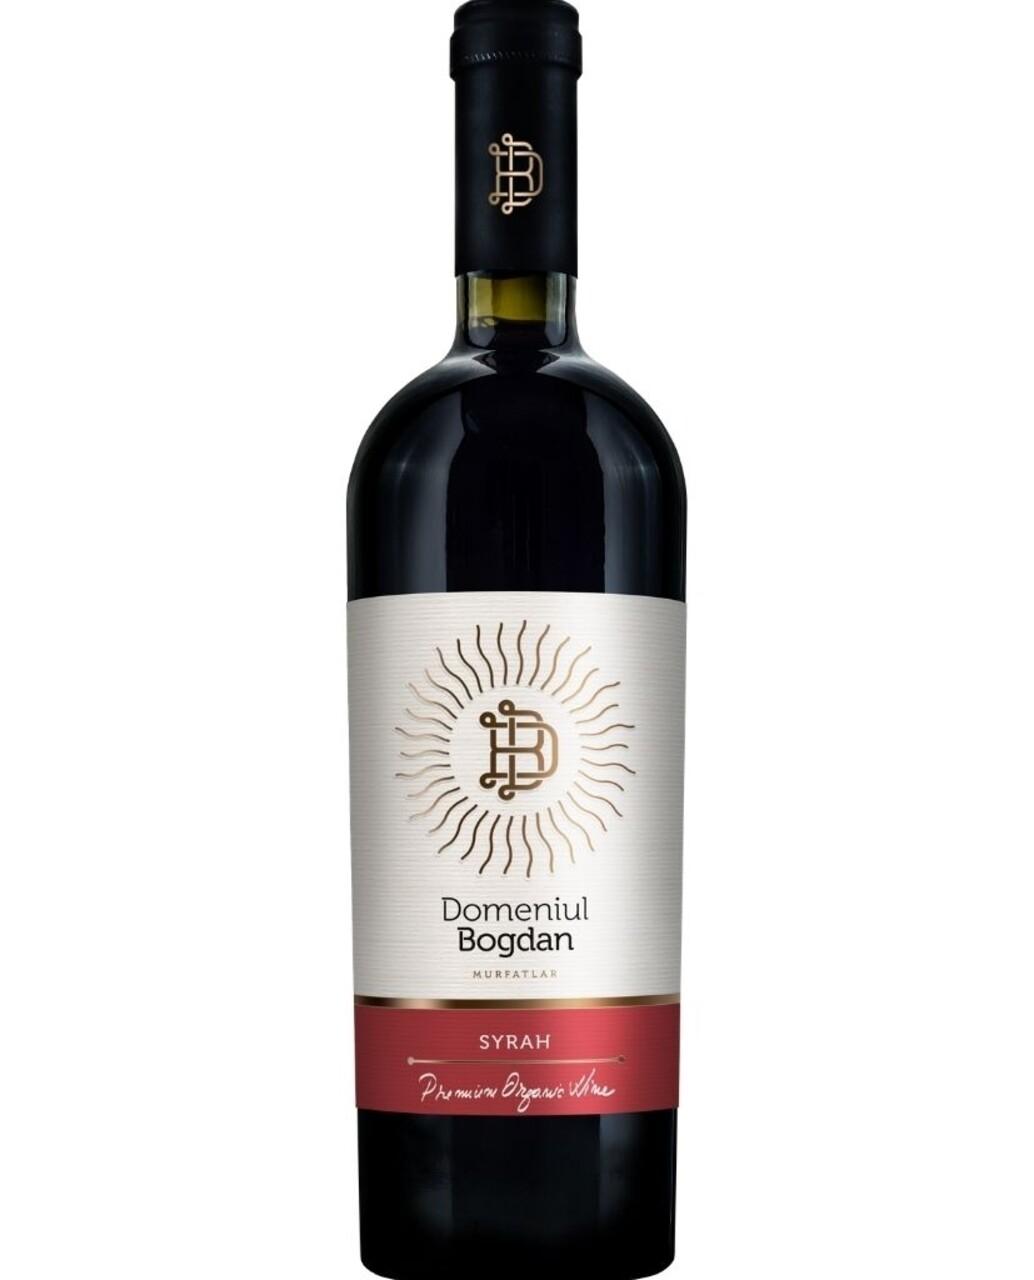 Domeniul Bogdan Premium Syrah